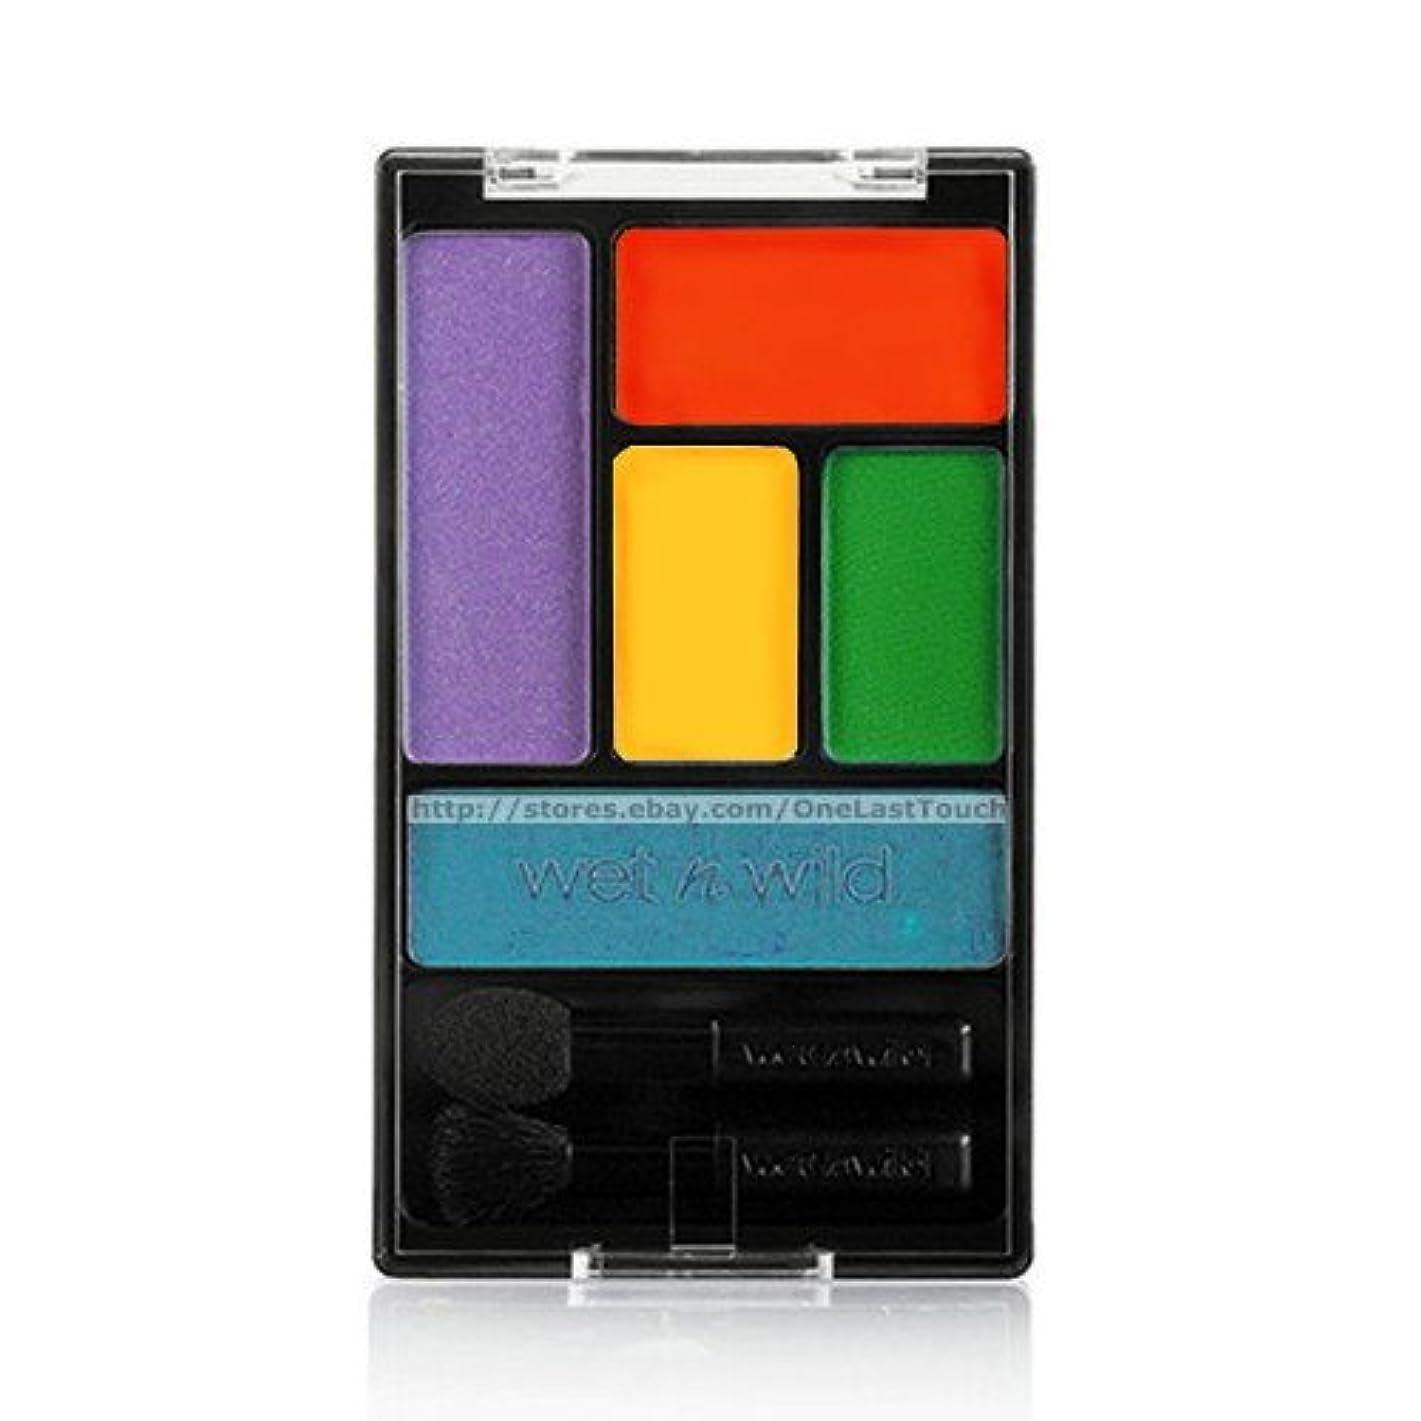 WET N WILD Color Icon Eyeshadow Palette 5 Pan - Art in the Streets (並行輸入品)